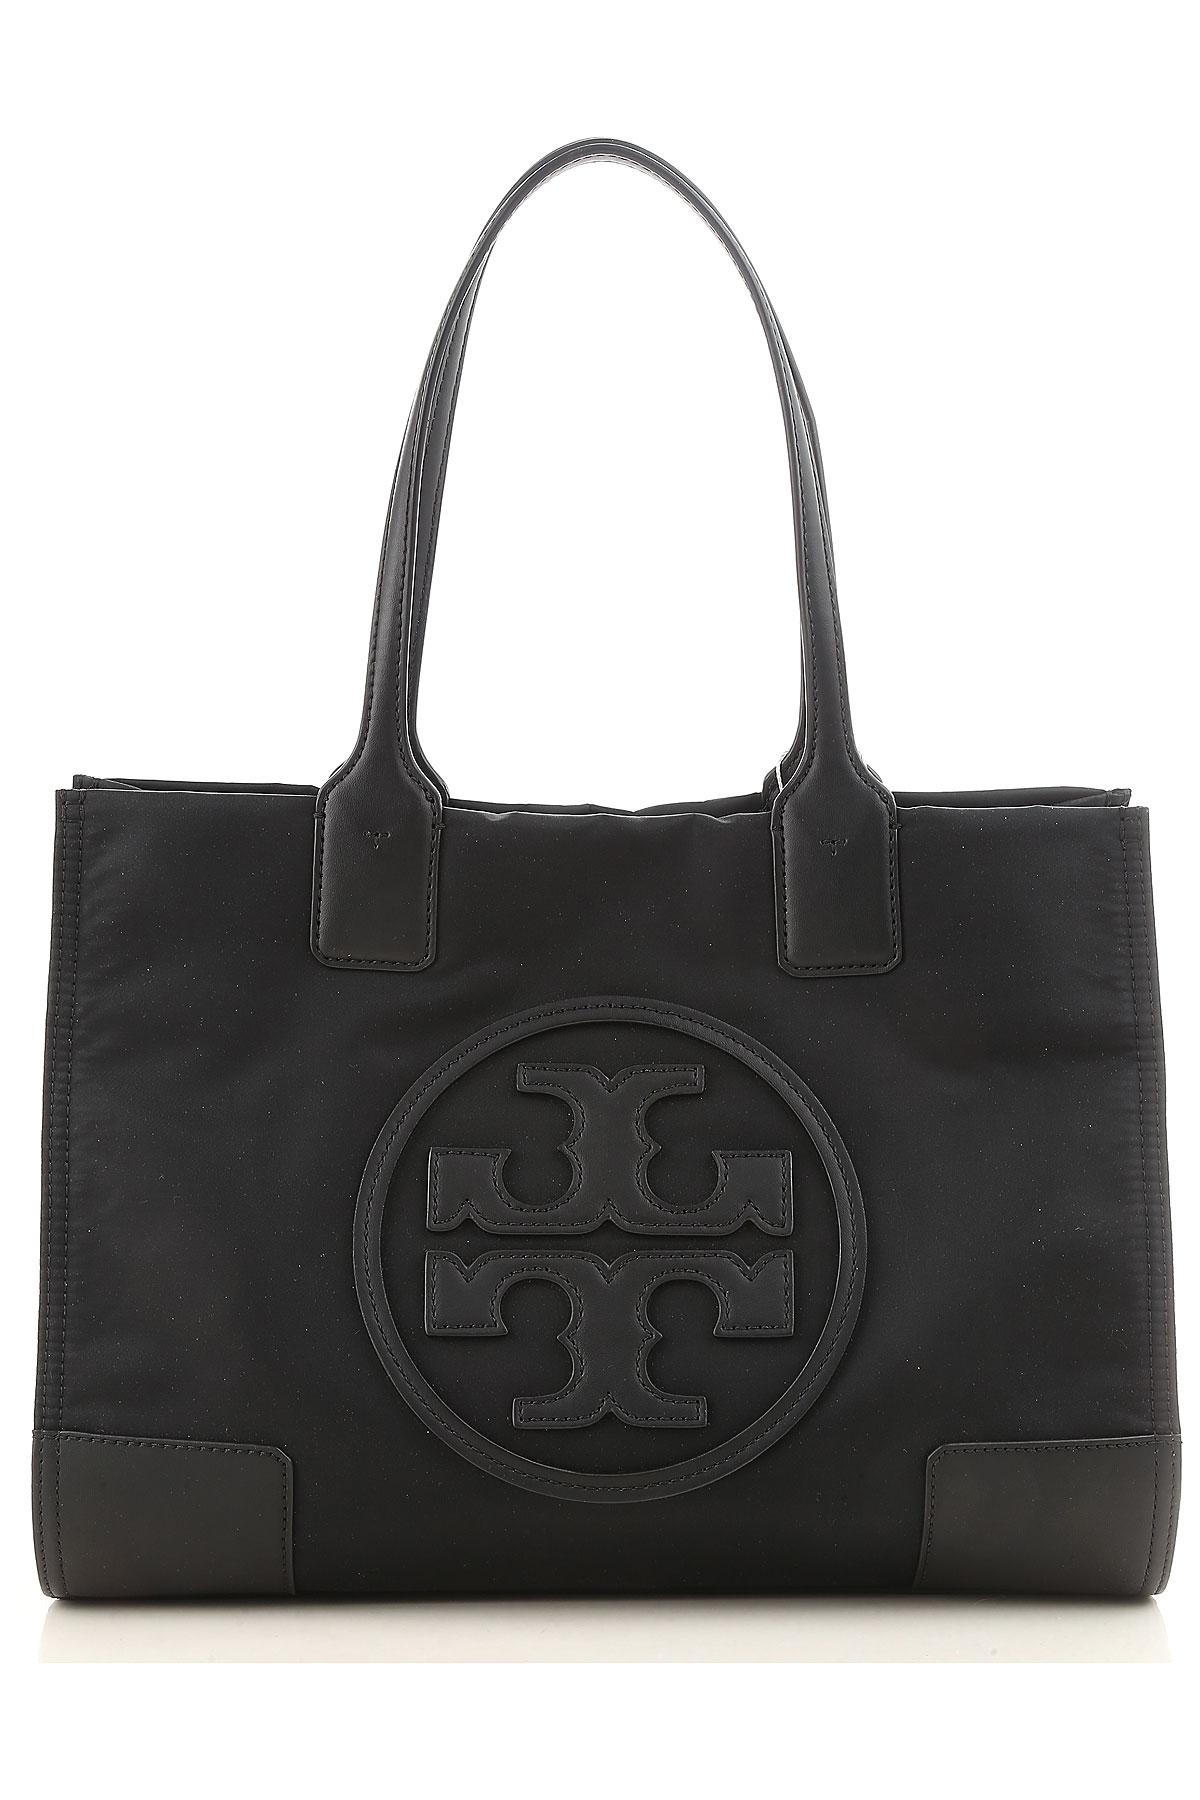 Tory Burch Tote Bag, Black, Nylon, 2017 USA-449489